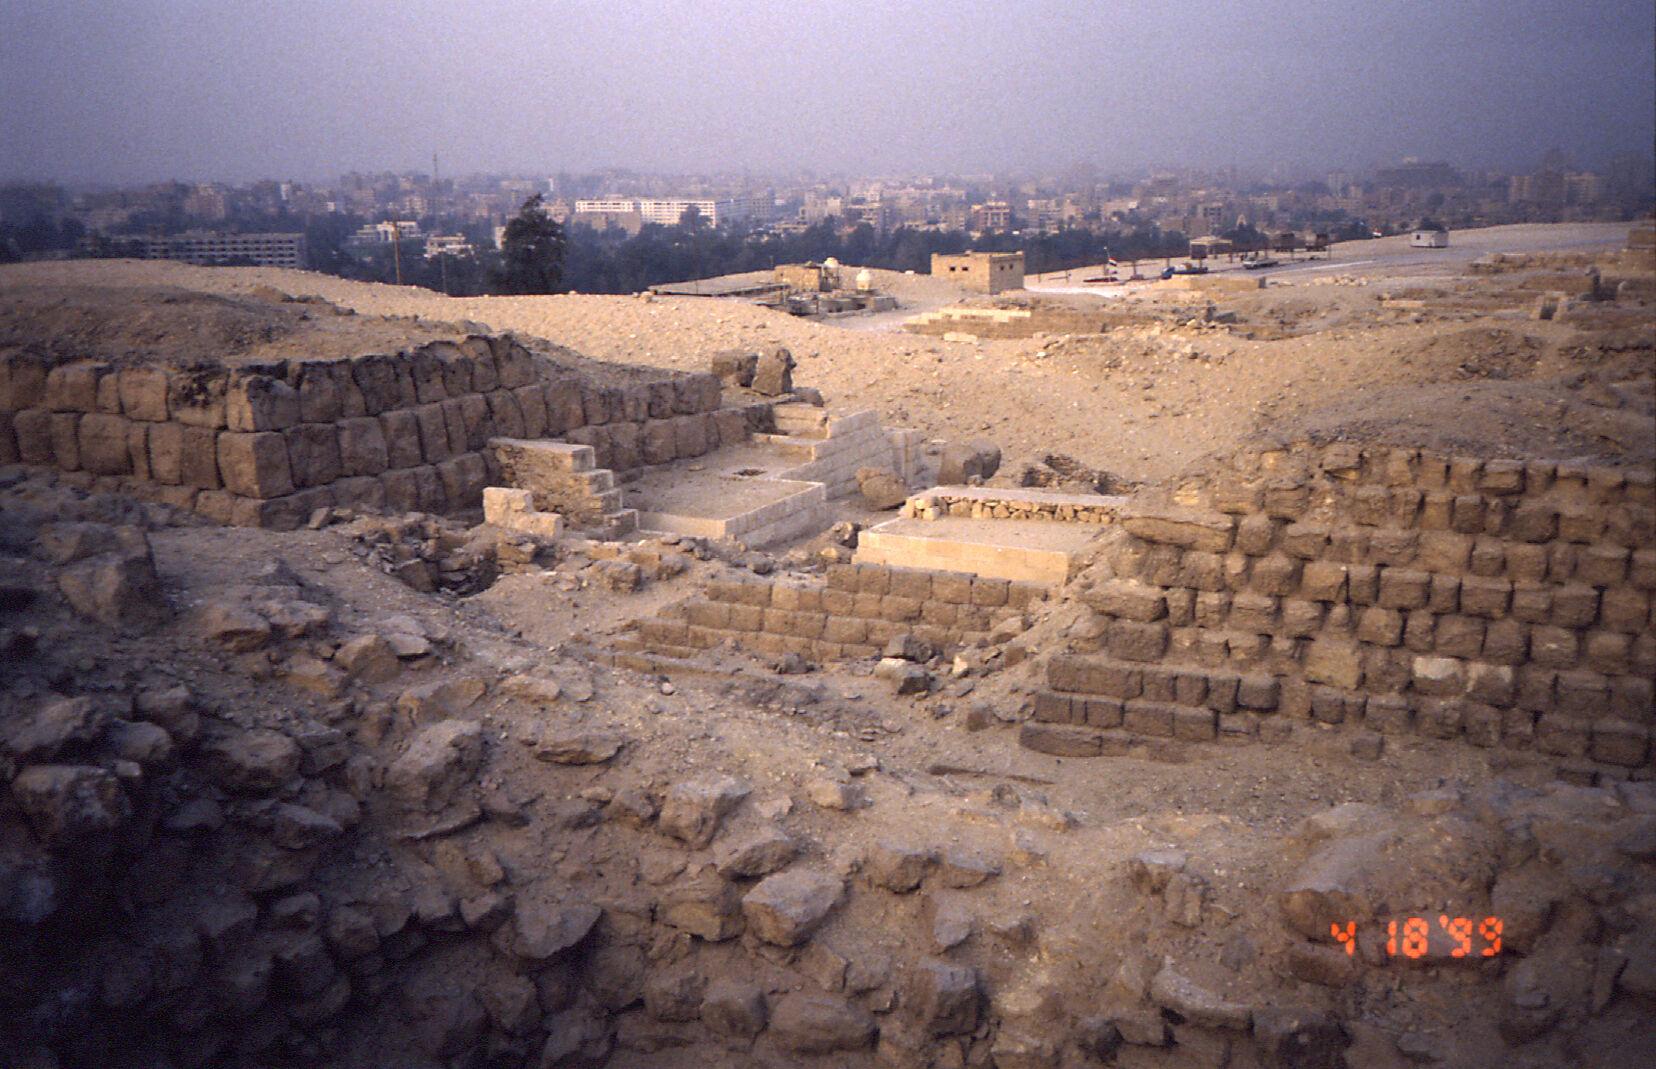 Western Cemetery: Site: Giza; View: G 2150, G 2151, G 2134, G 2138, G 2156', G 2220